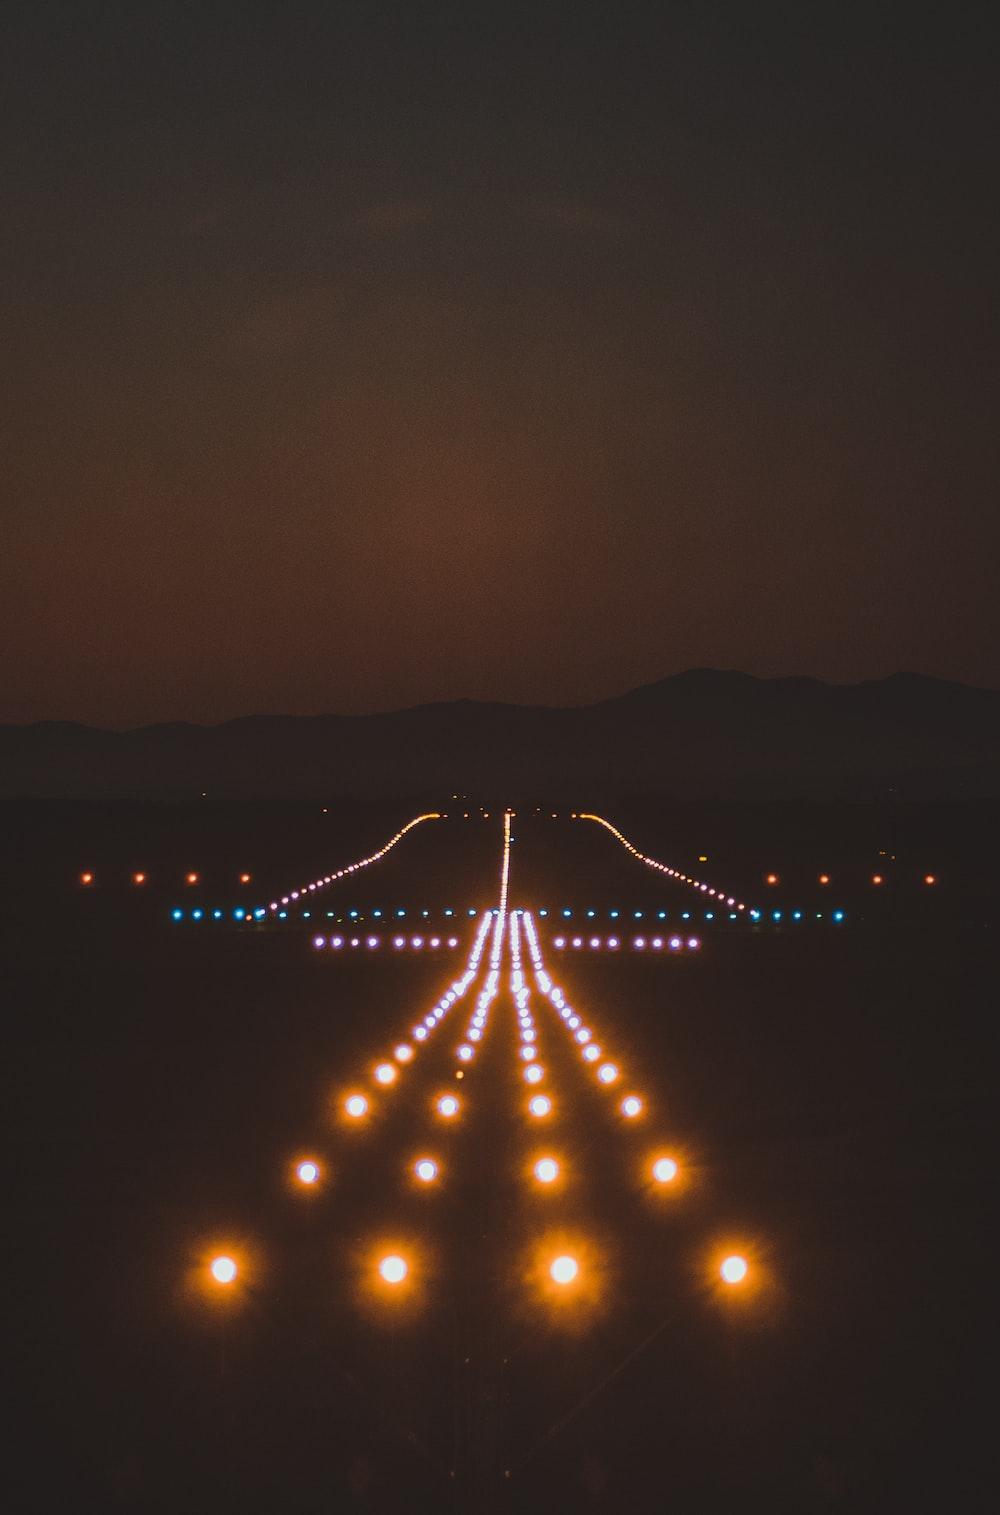 assorted-color lights